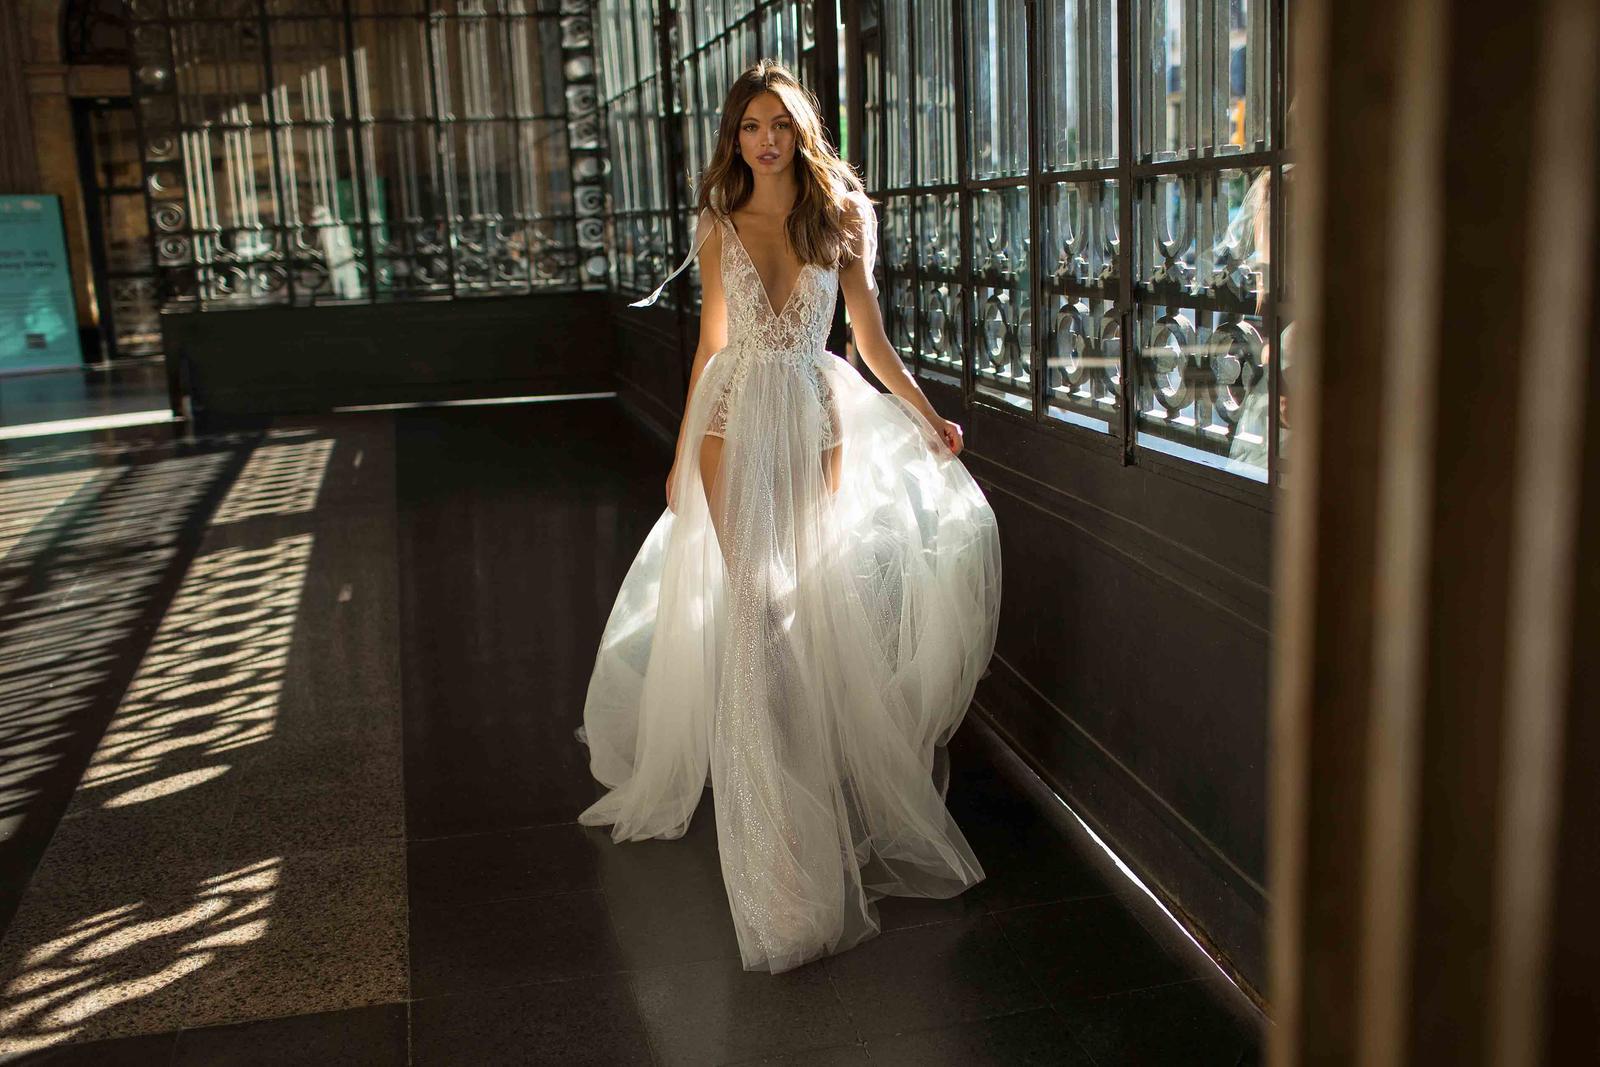 Muse by Berta * Svadobné šaty z kolekcií na rok 2019 - Obrázok č. 22